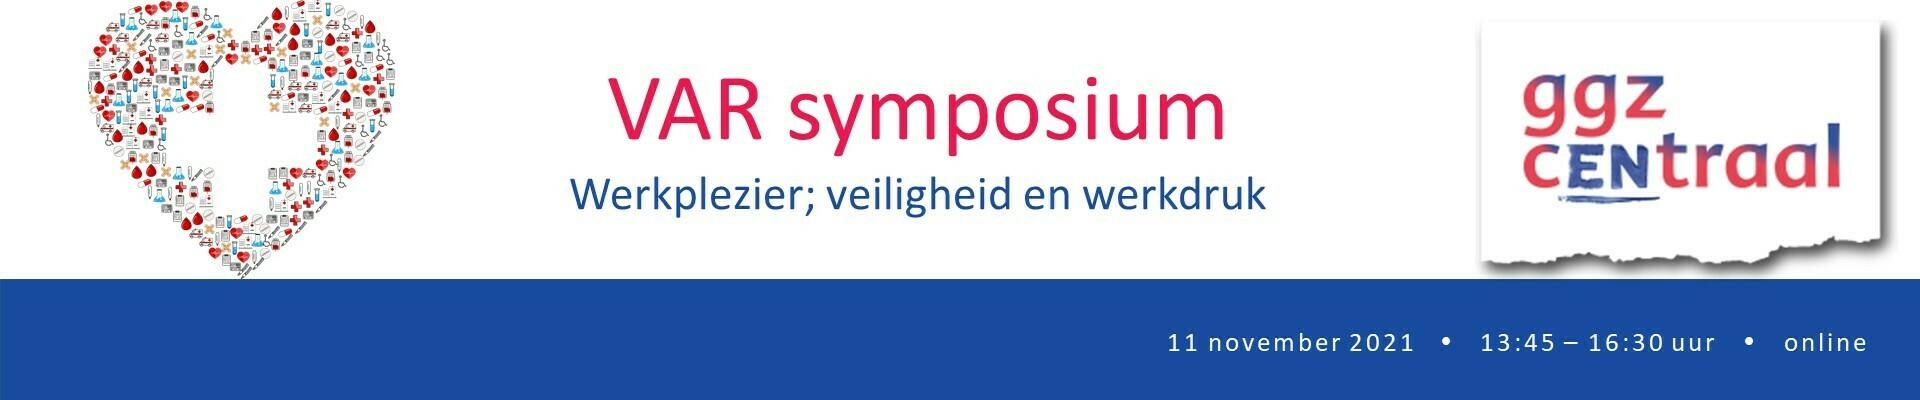 VAR najaarssymposium